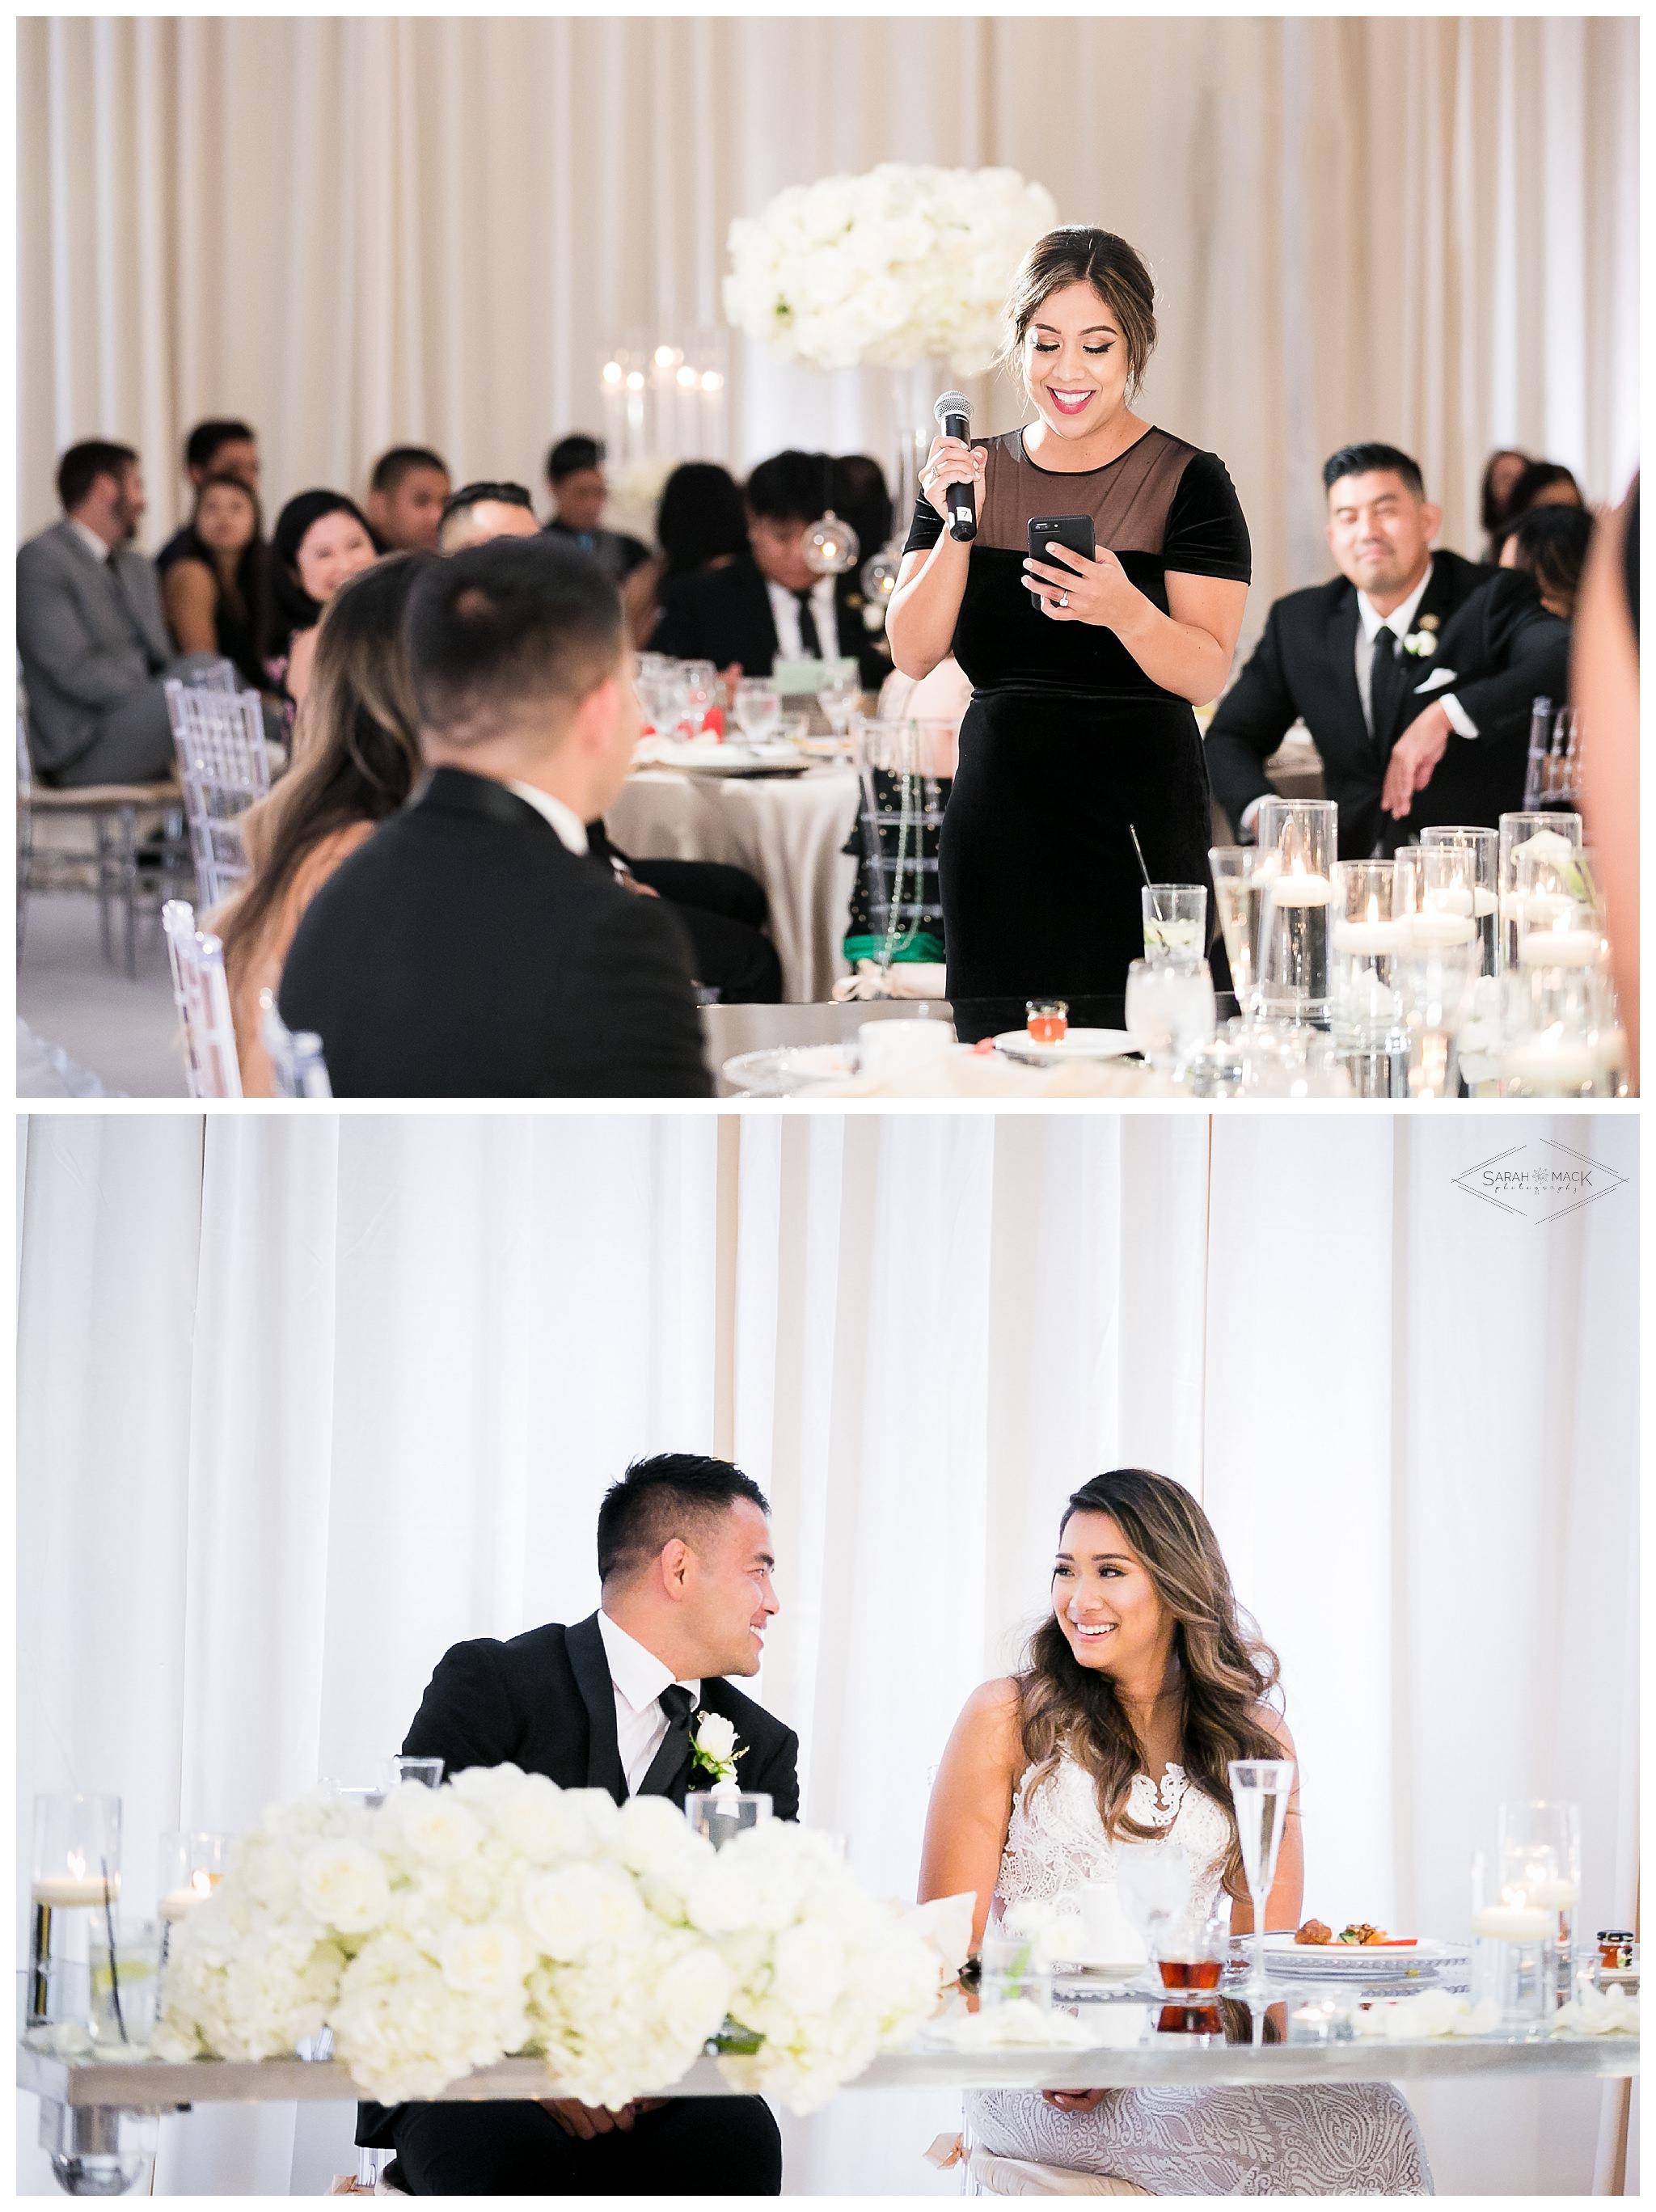 LE-Avenue-of-the-Arts-Costa-Mesa-Wedding-Photography-0192.jpg